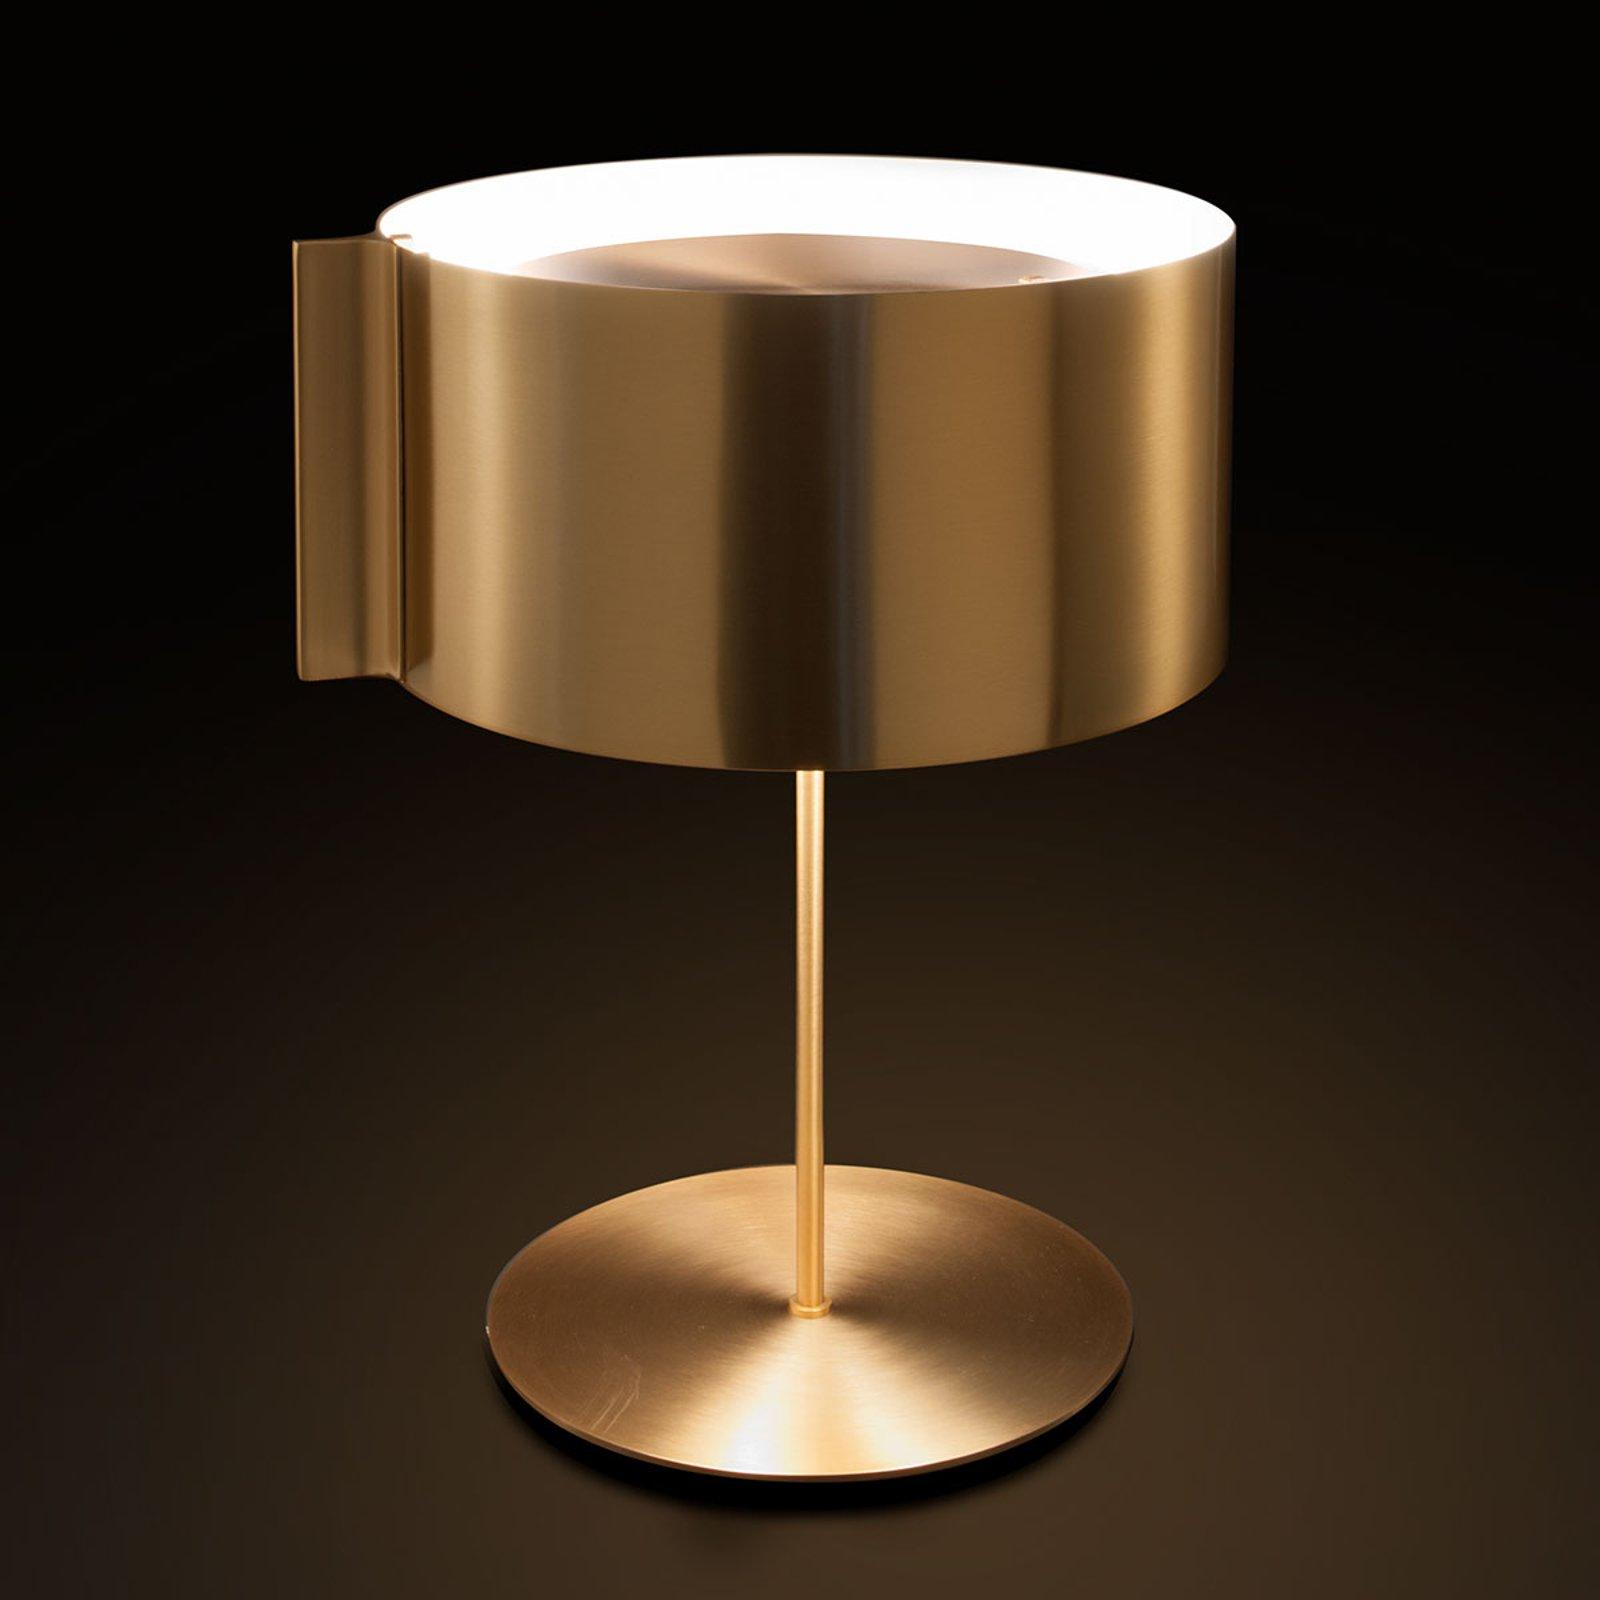 Oluce Switch - gyllen designerbordlampe